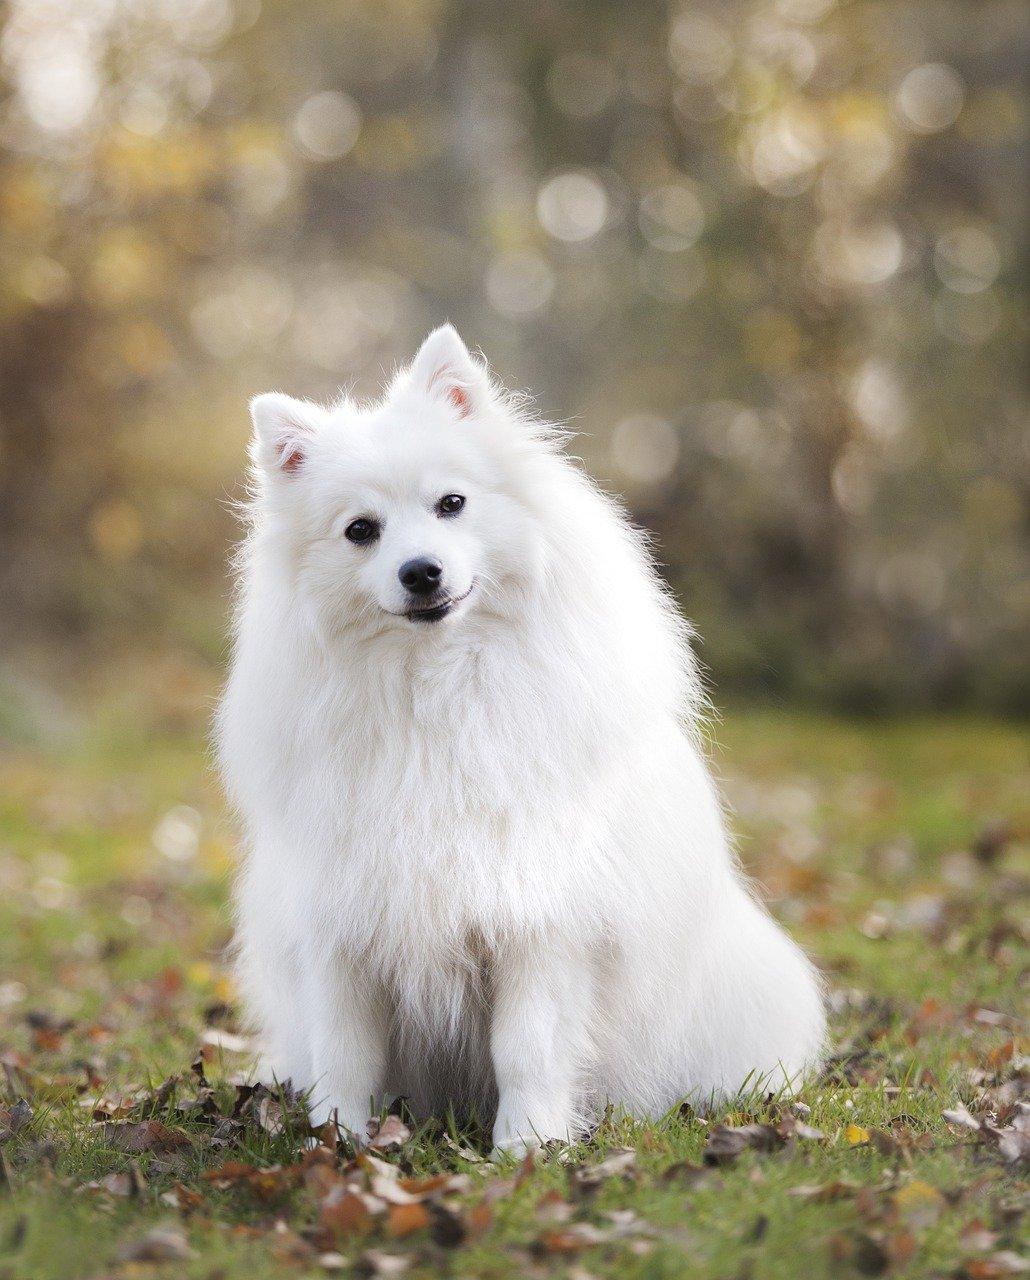 dog, puppy, canine